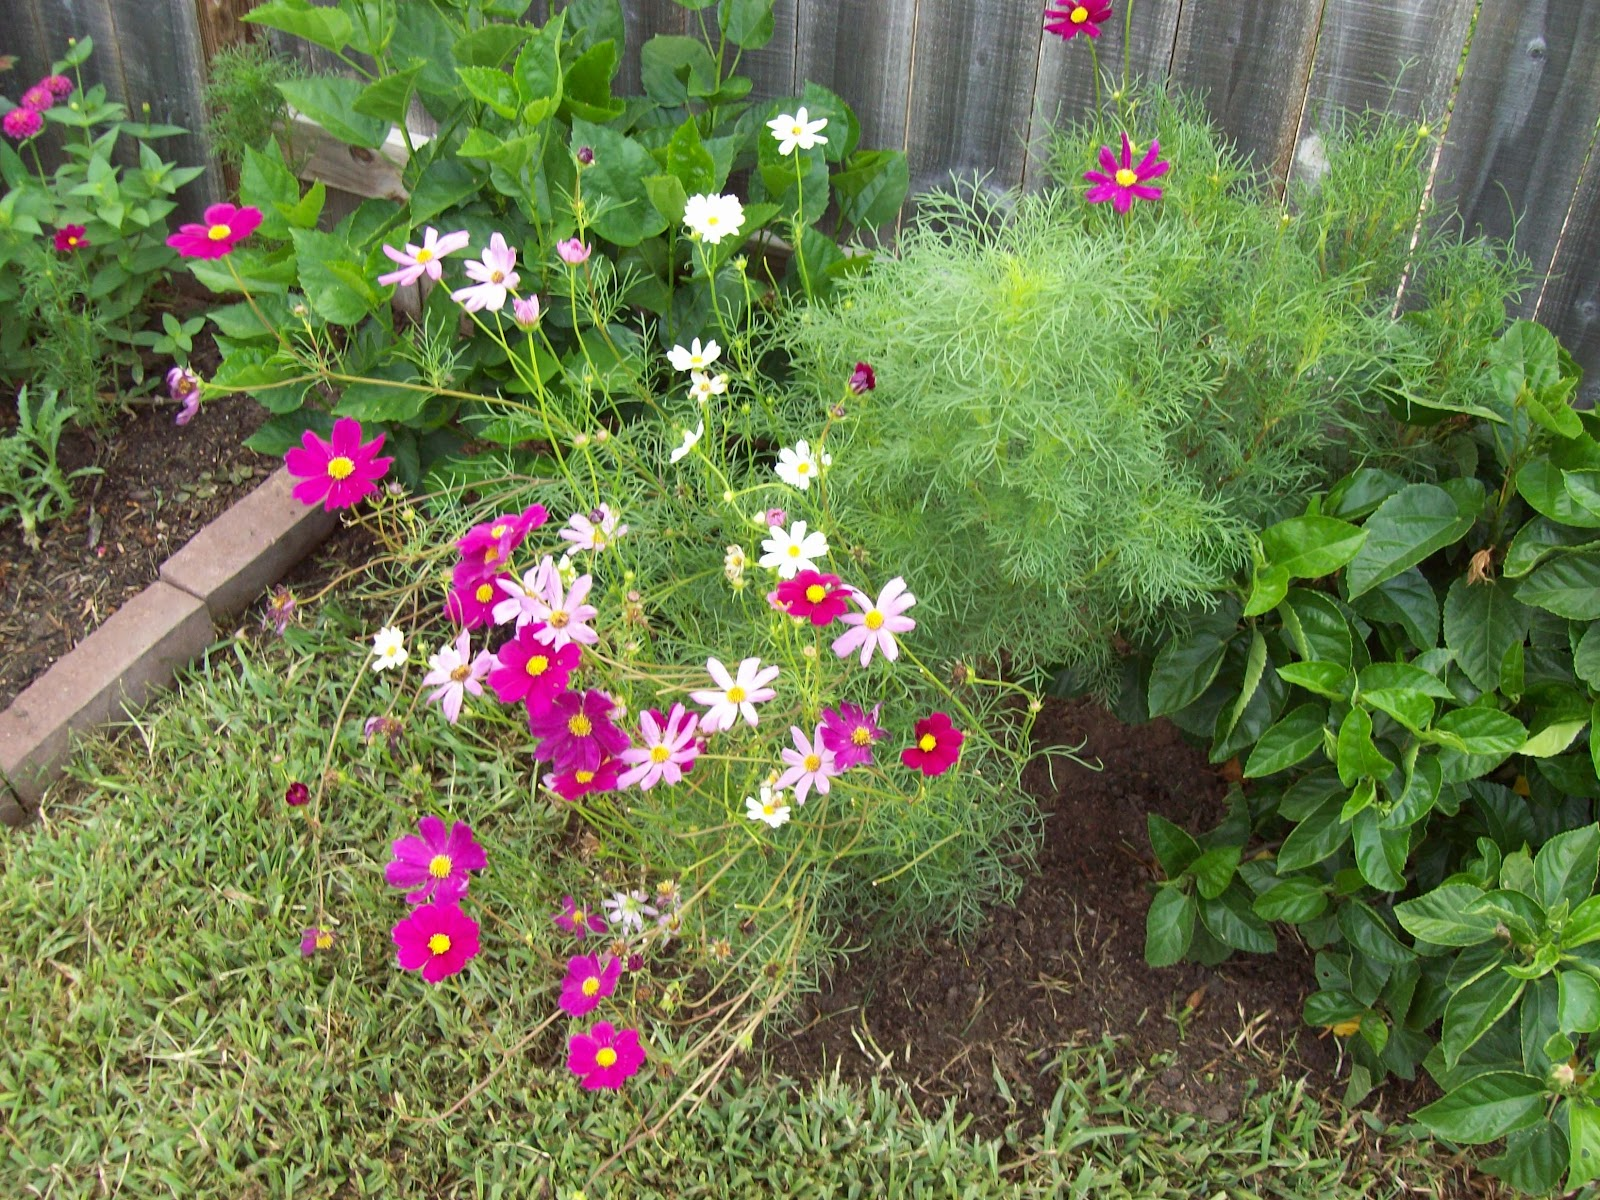 Gardening 2009 - 101_4658.JPG